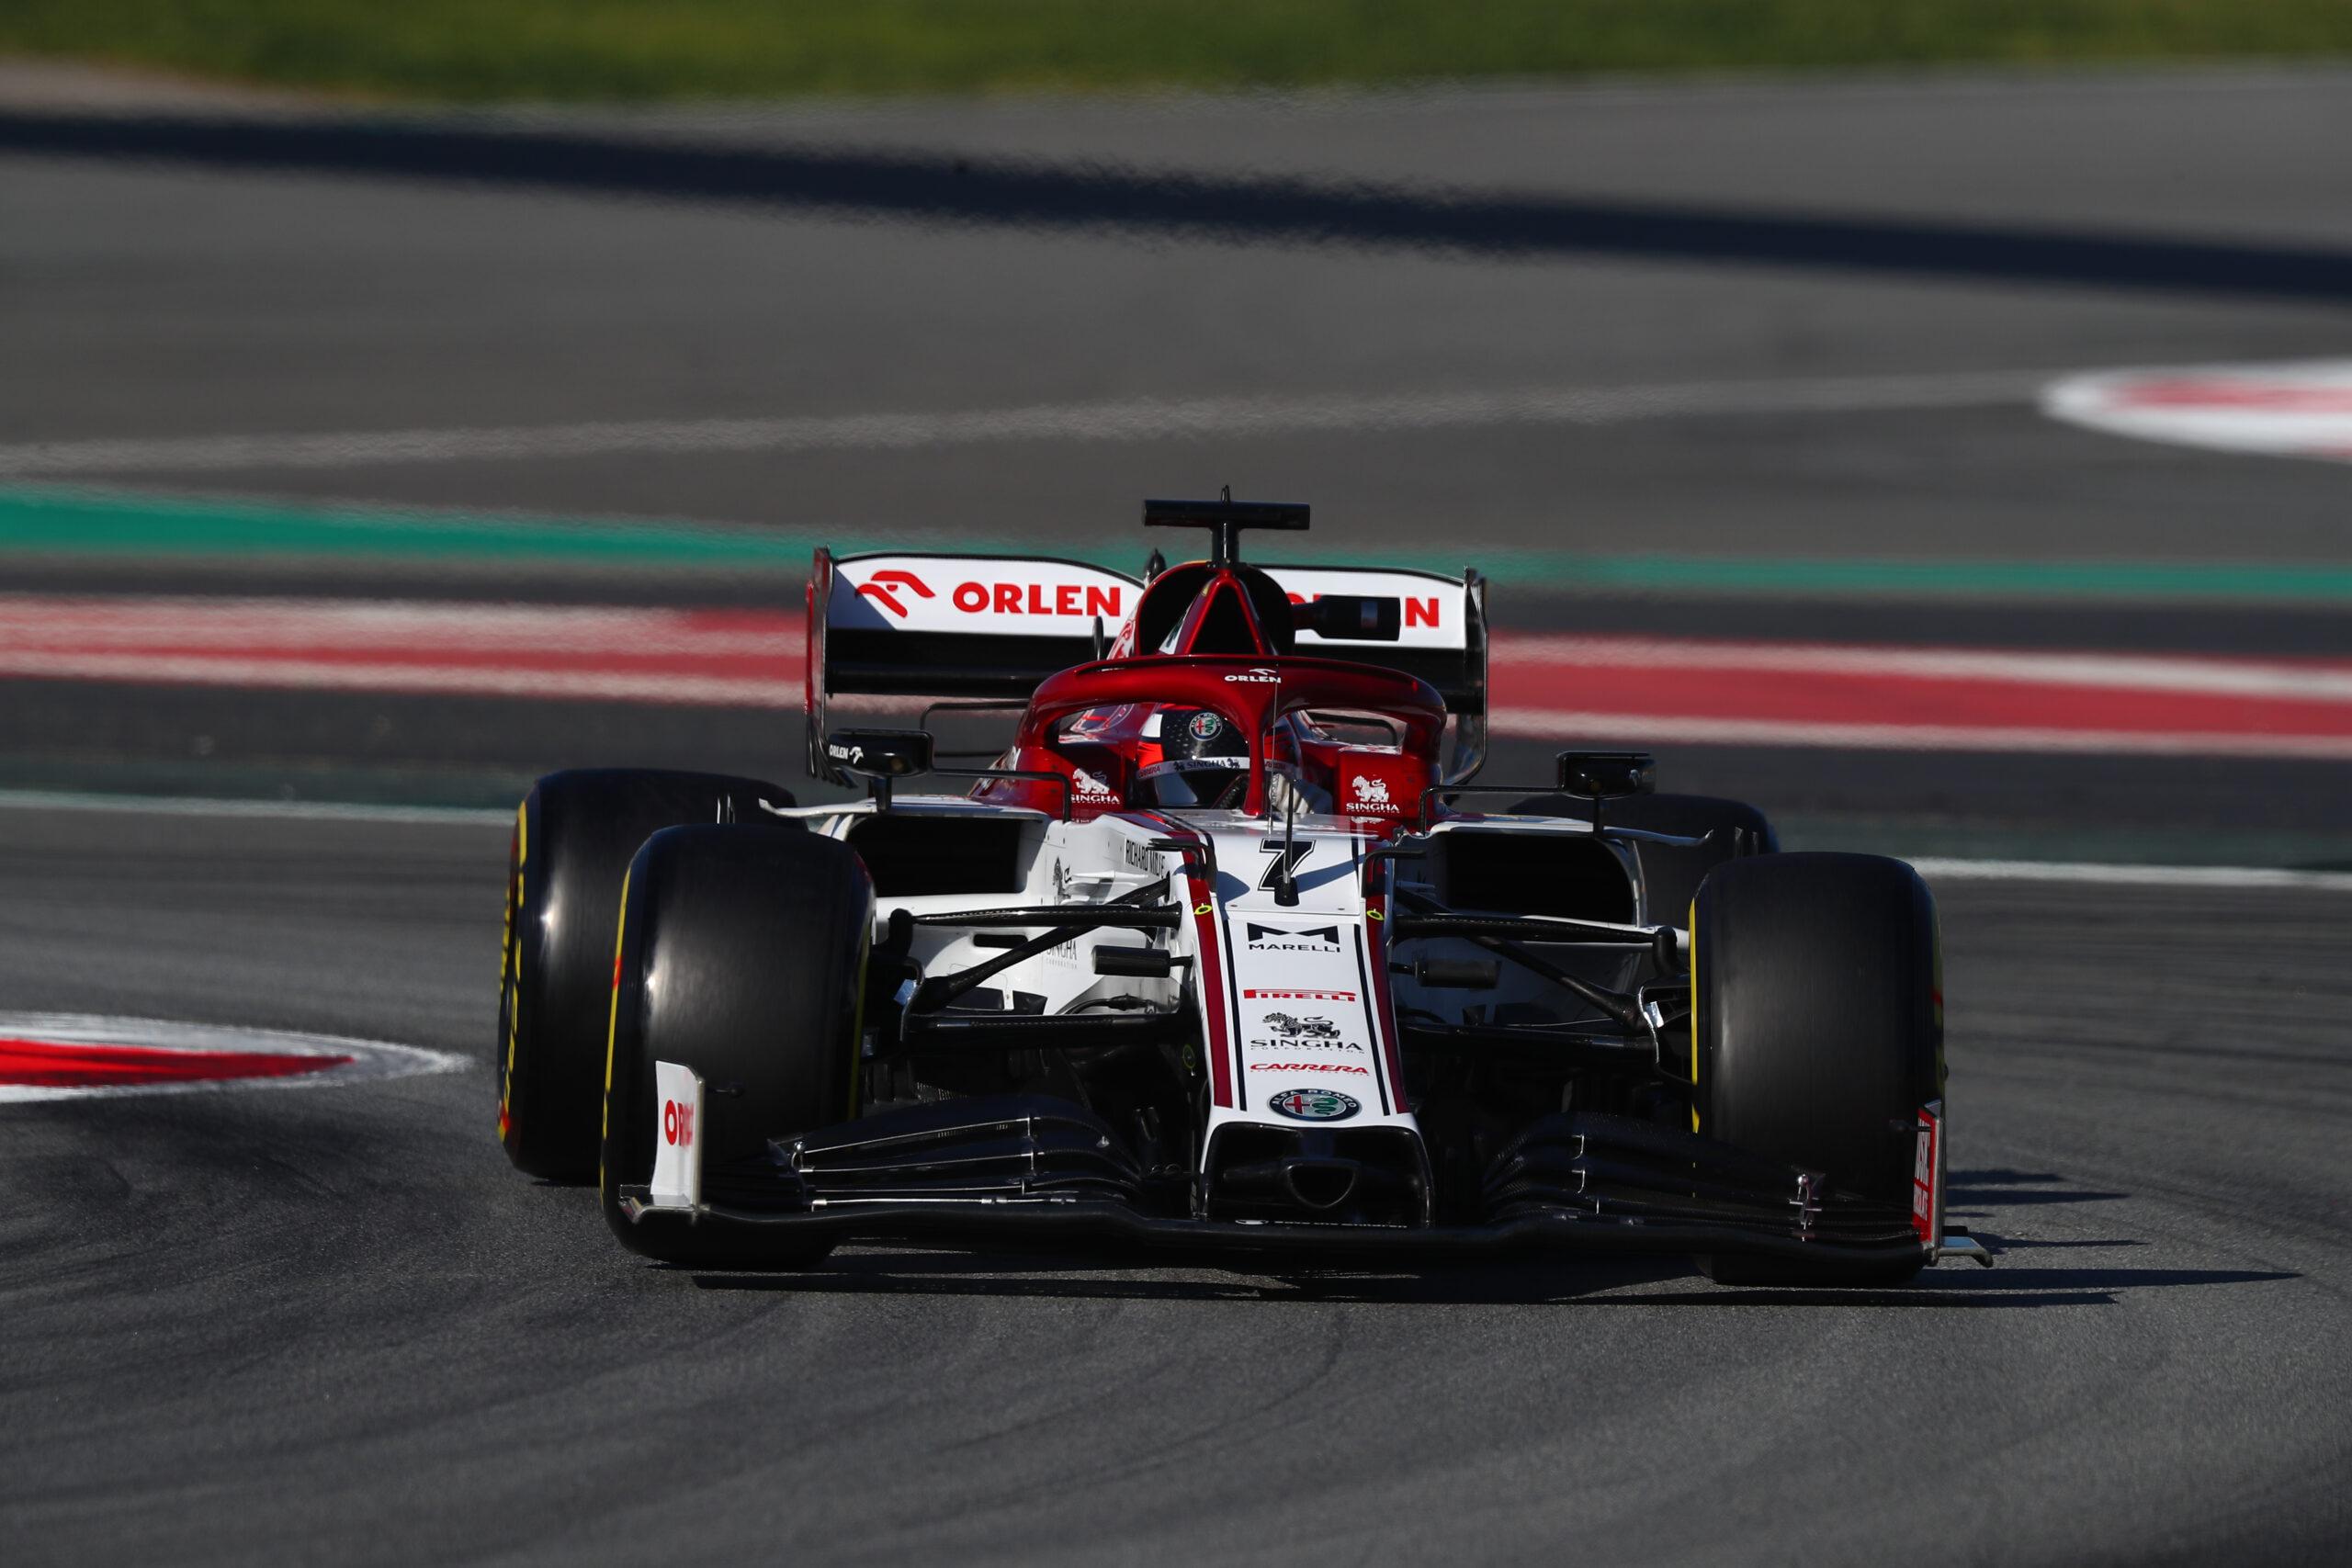 Vijfdaagse busreis – Formule 1 Oostenrijk – Spielberg 2022